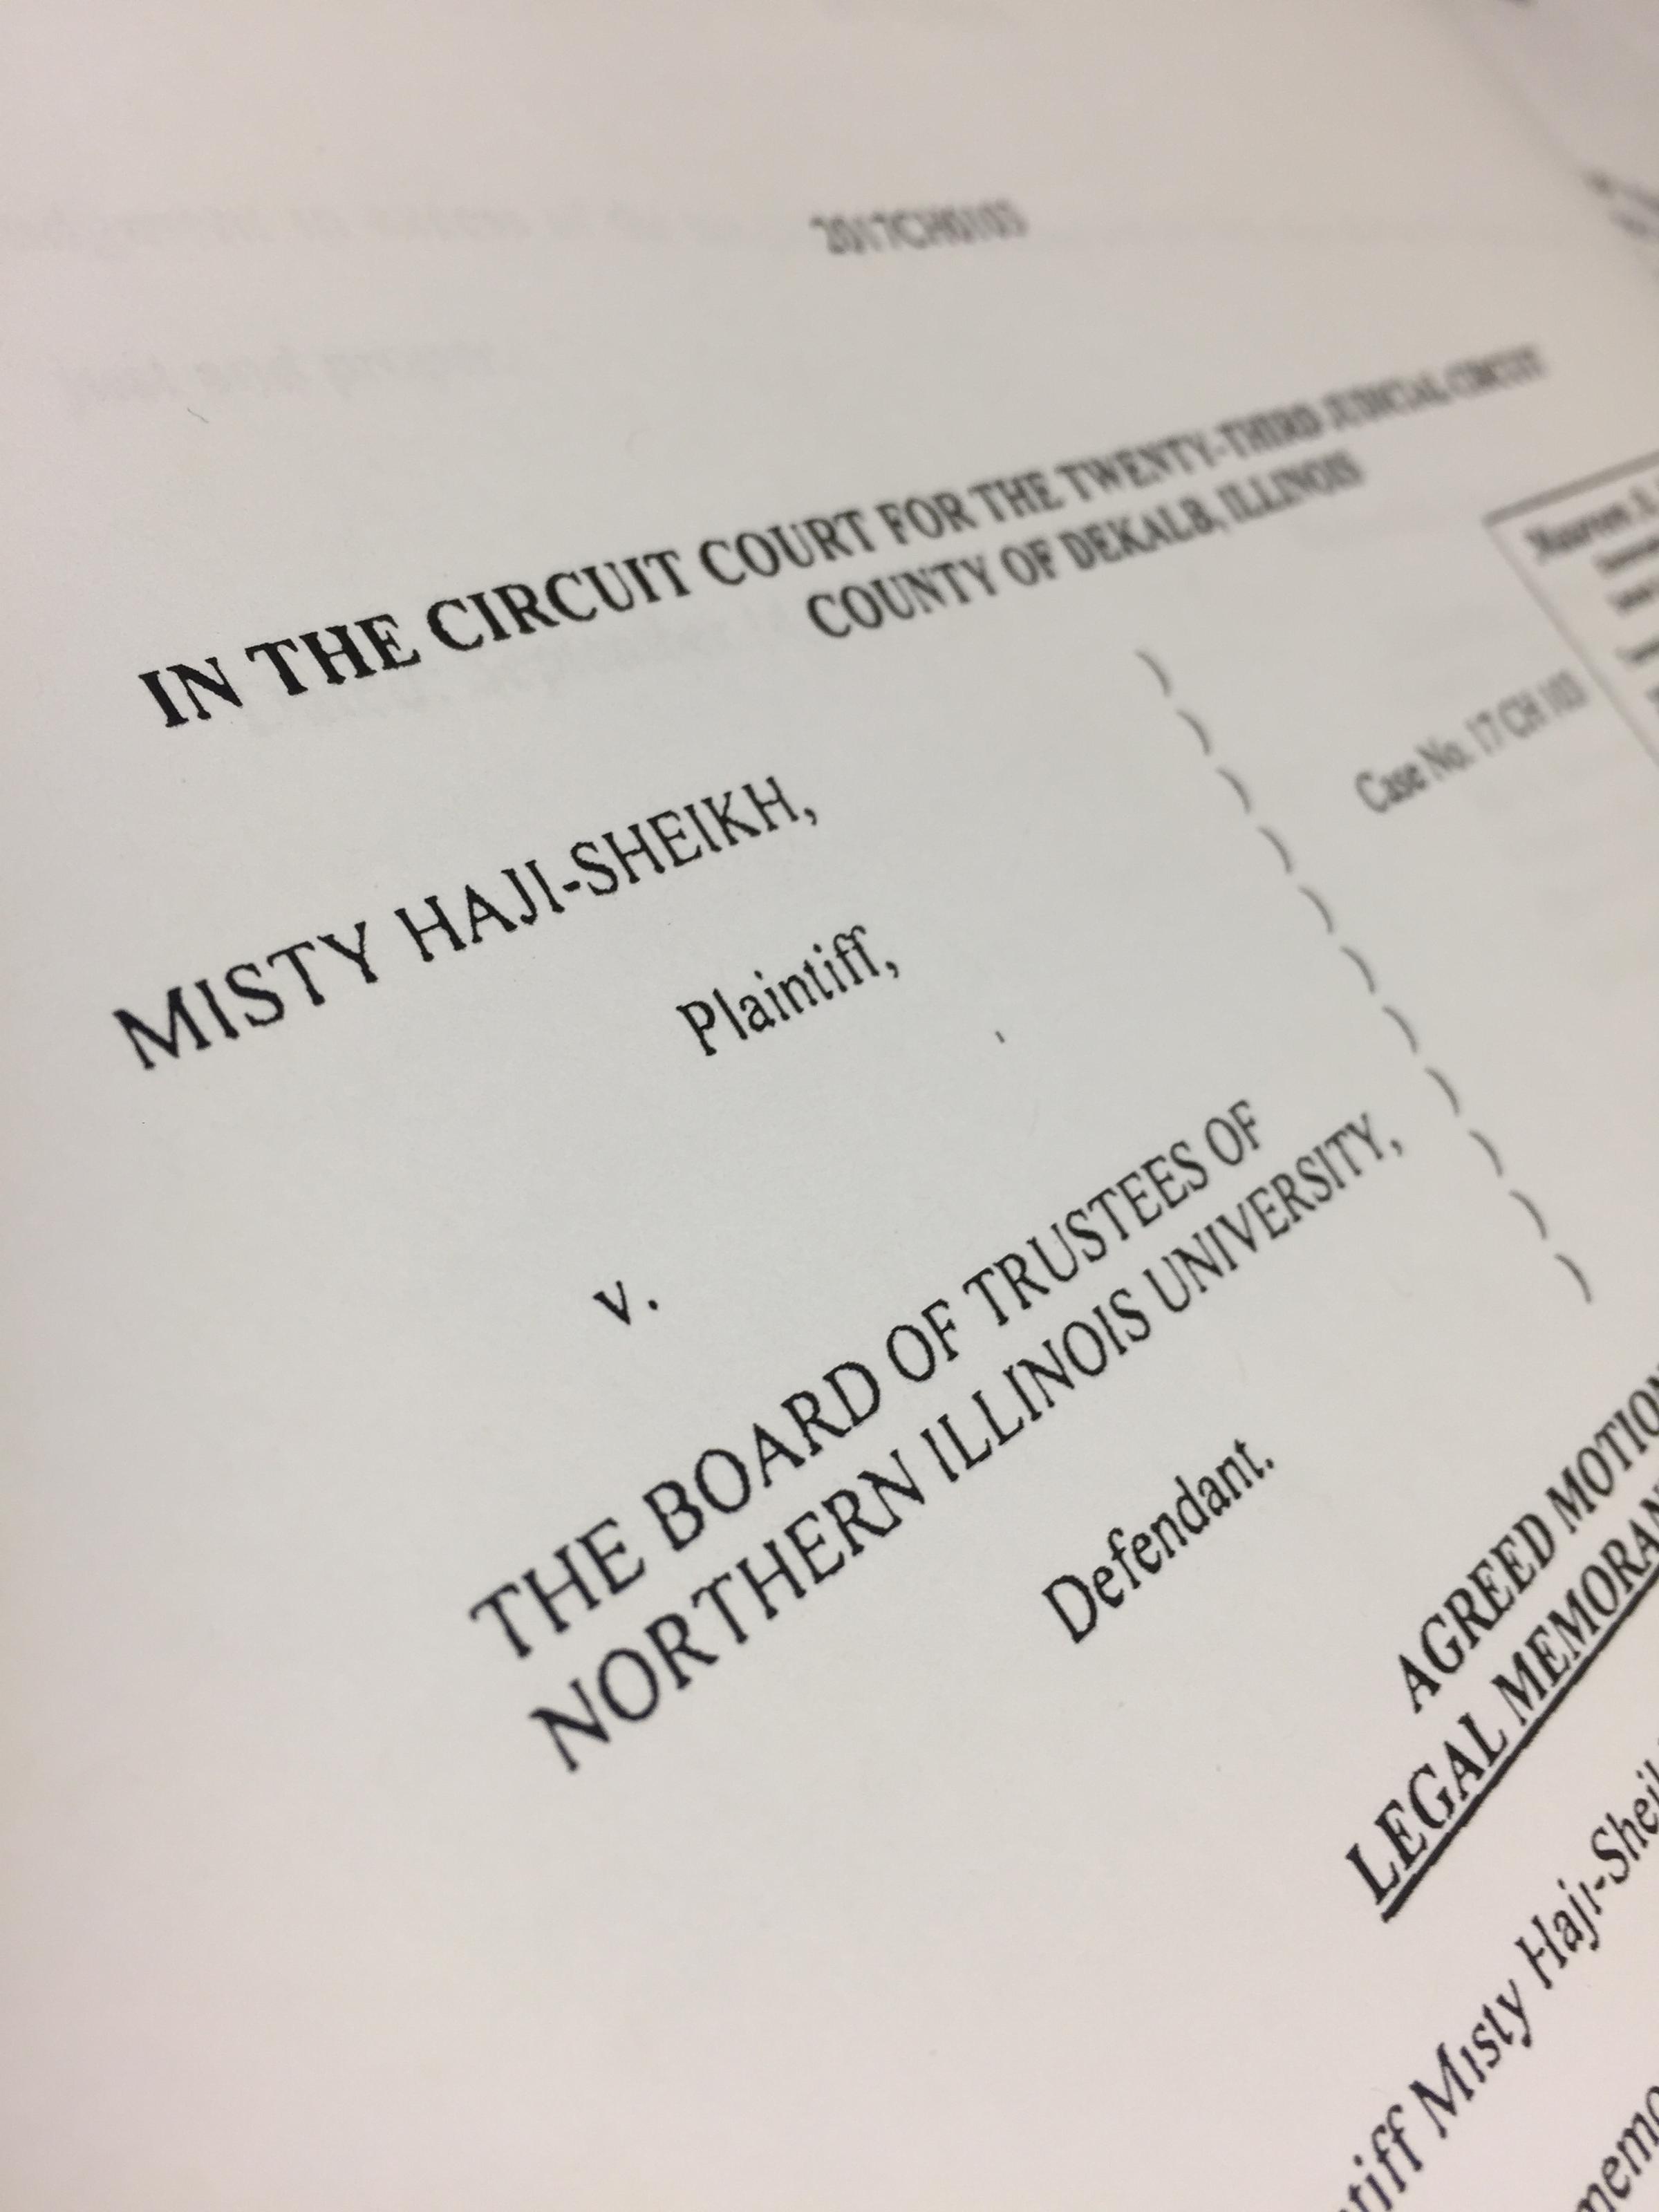 DeKalb County Judge Ruled Haji-Sheikh Entitled To Attorney